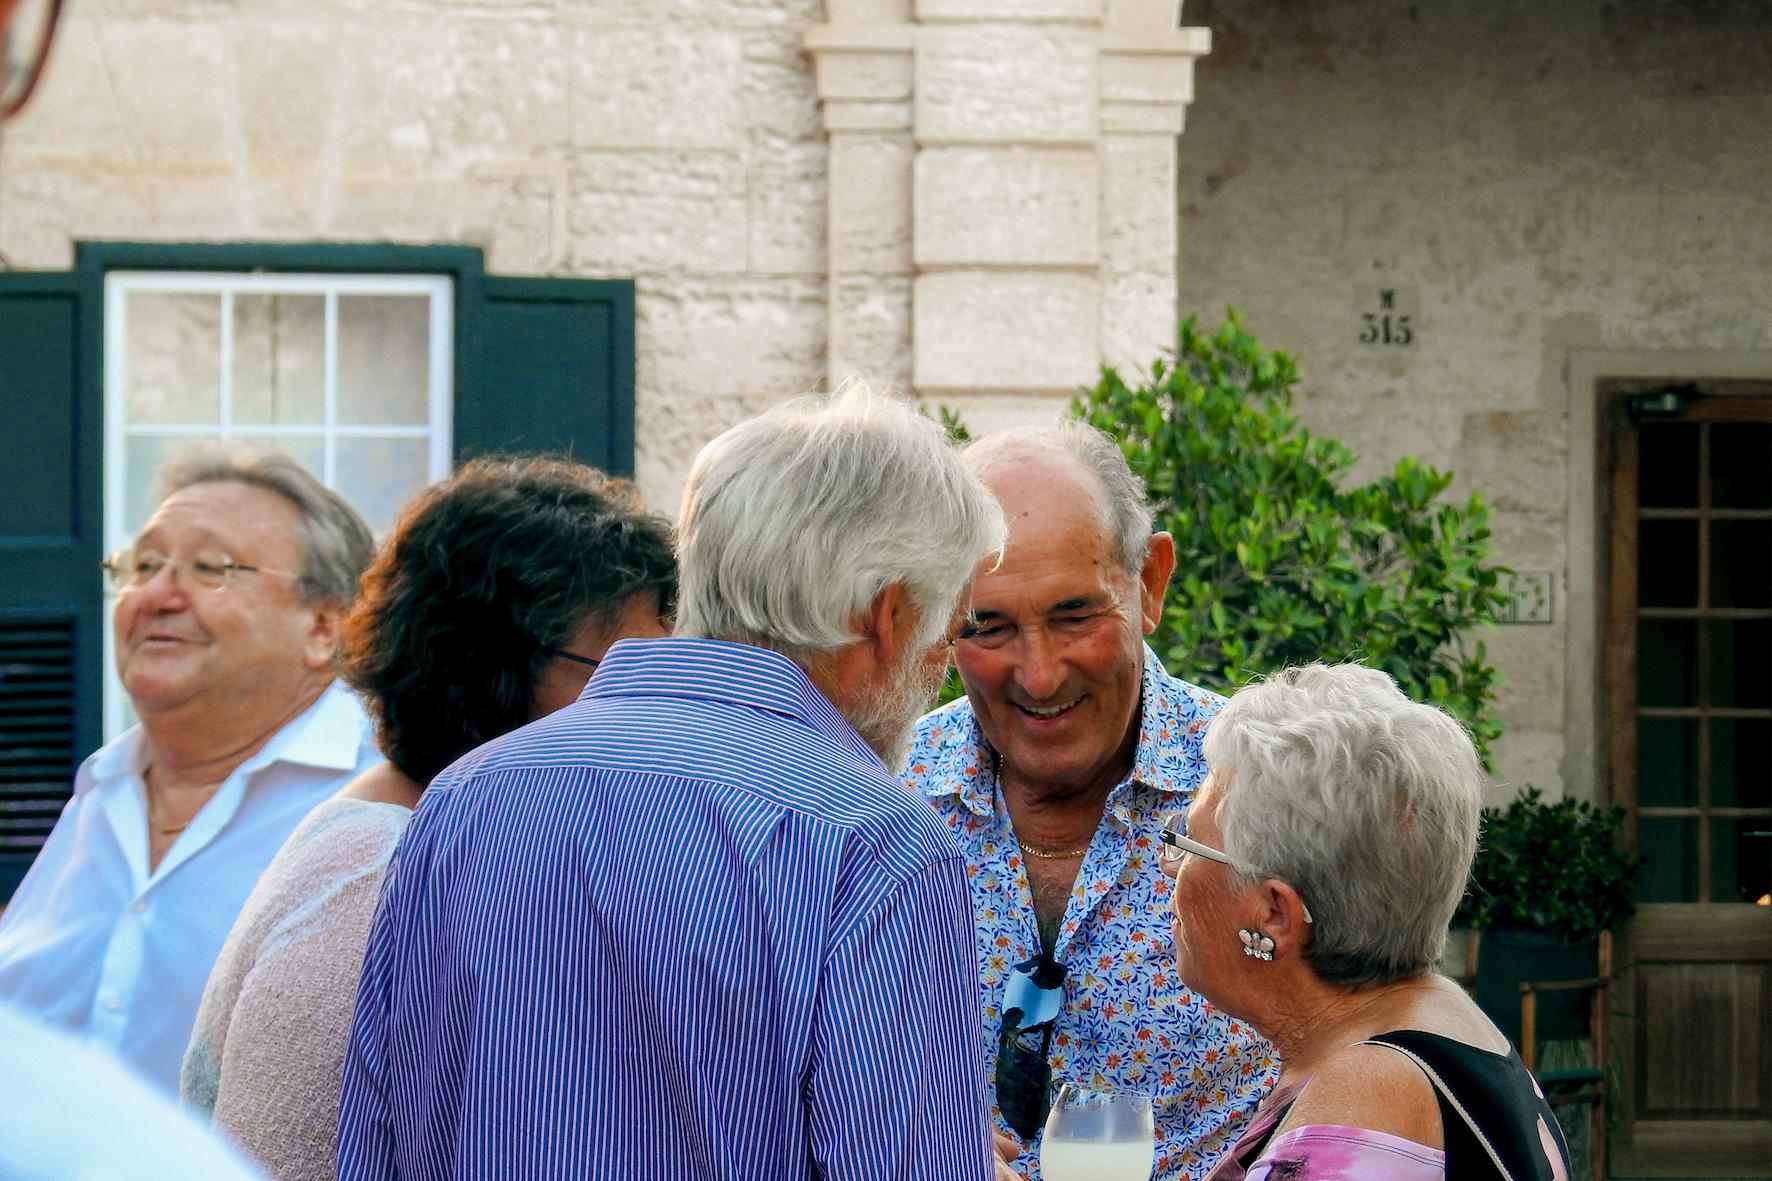 Fiest30aniversarioBonnin3 1 - Birthday party celebrating three decades of leadership